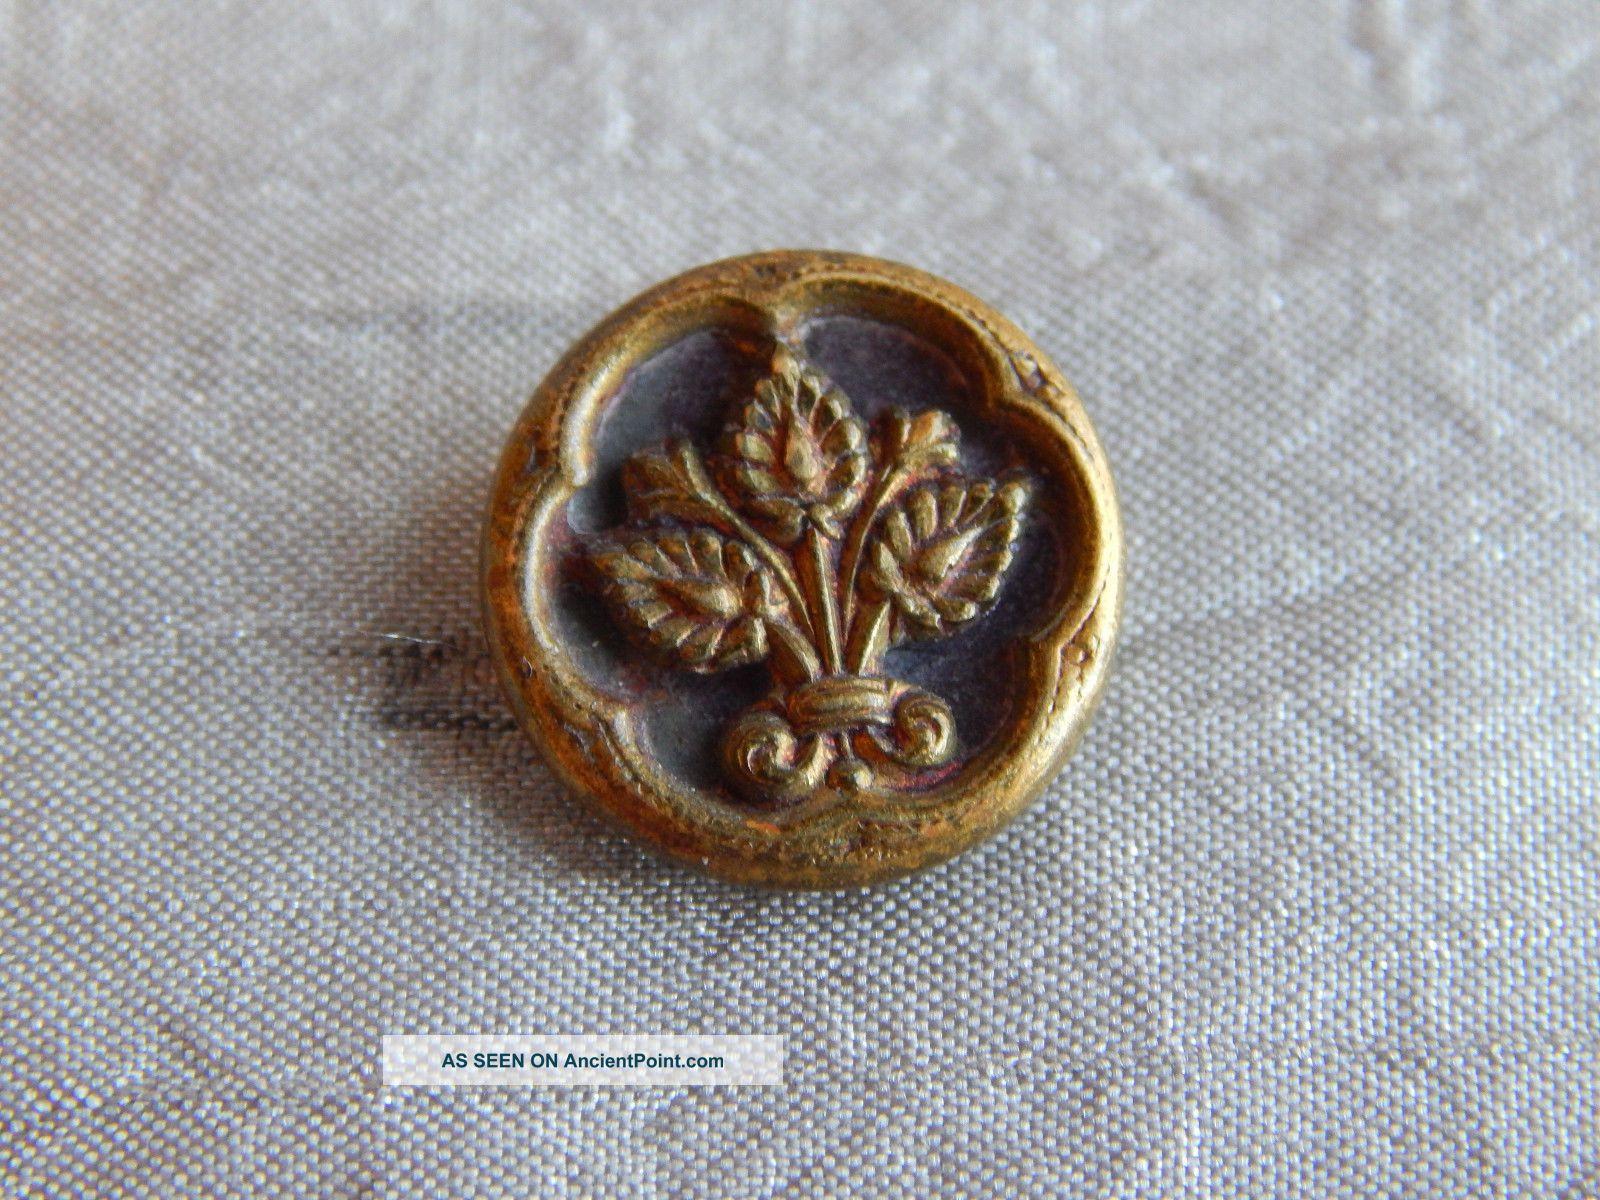 Antique Vintage Brass Picture Button Leaf Flower 1319 - A Buttons photo